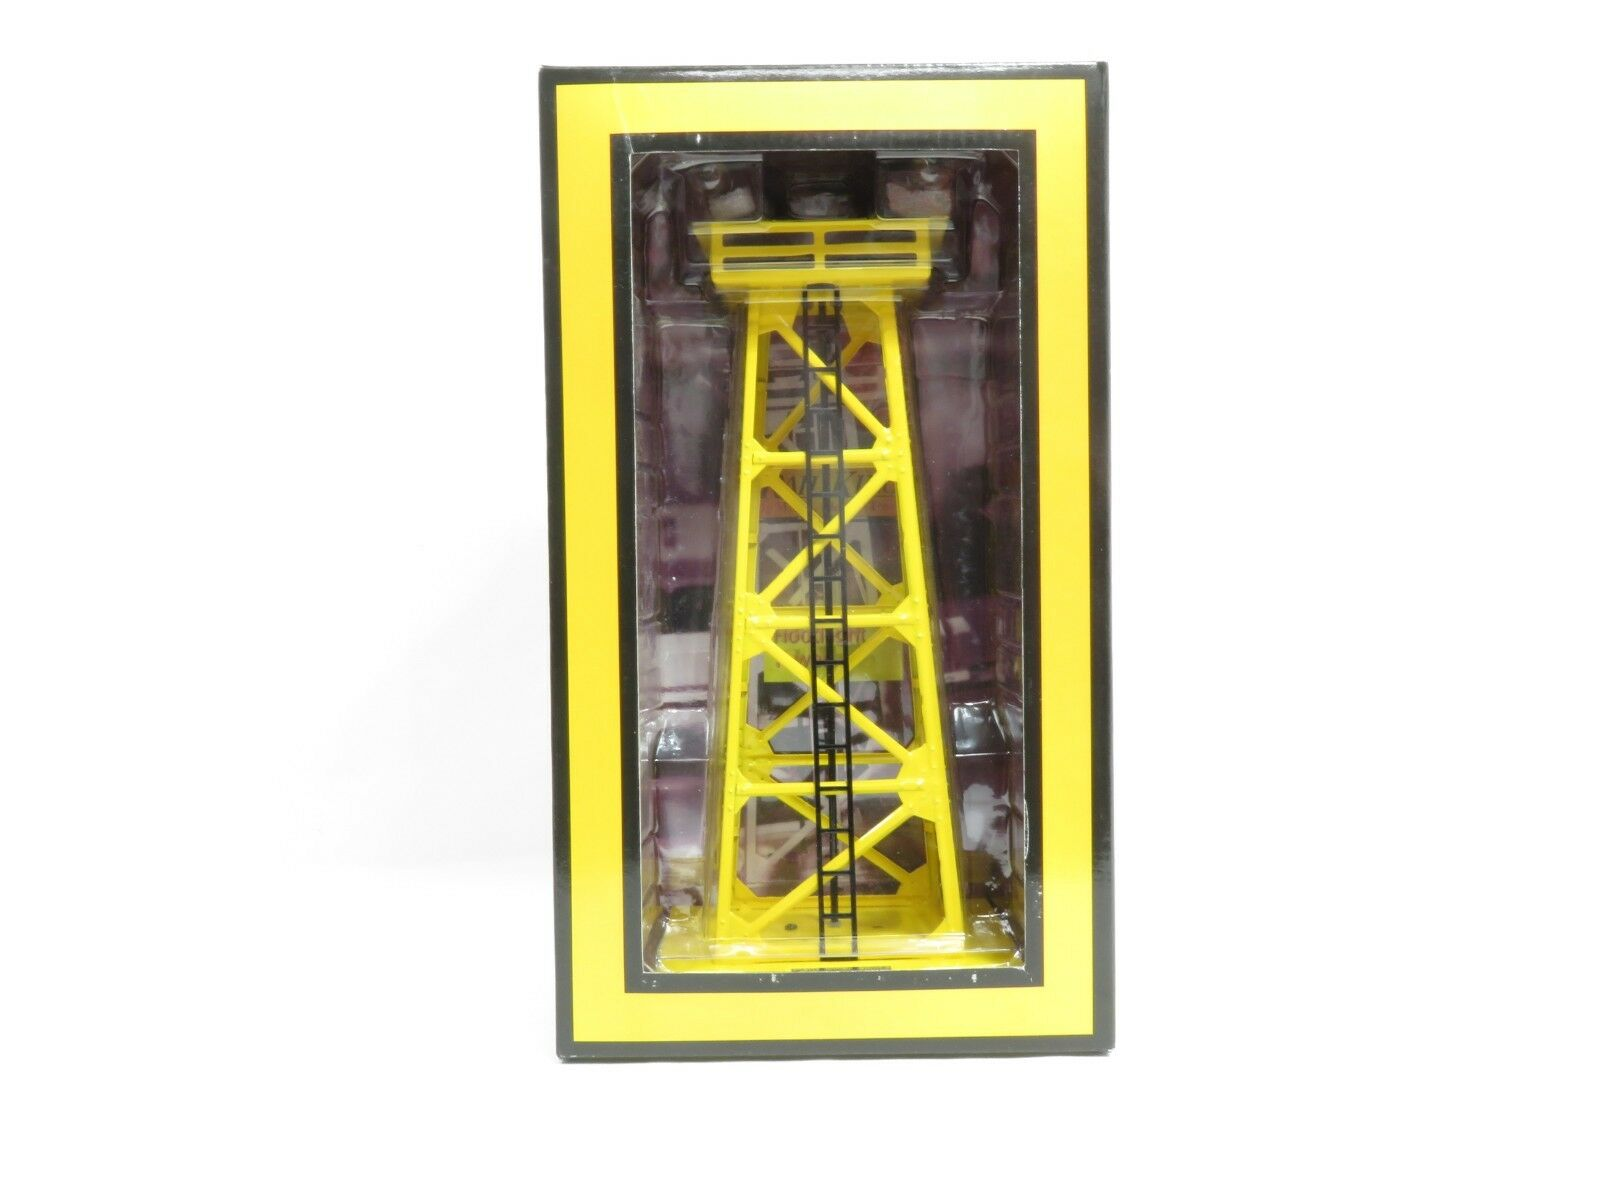 MTH 30-9025 Yellow Floodlight Tower NIB